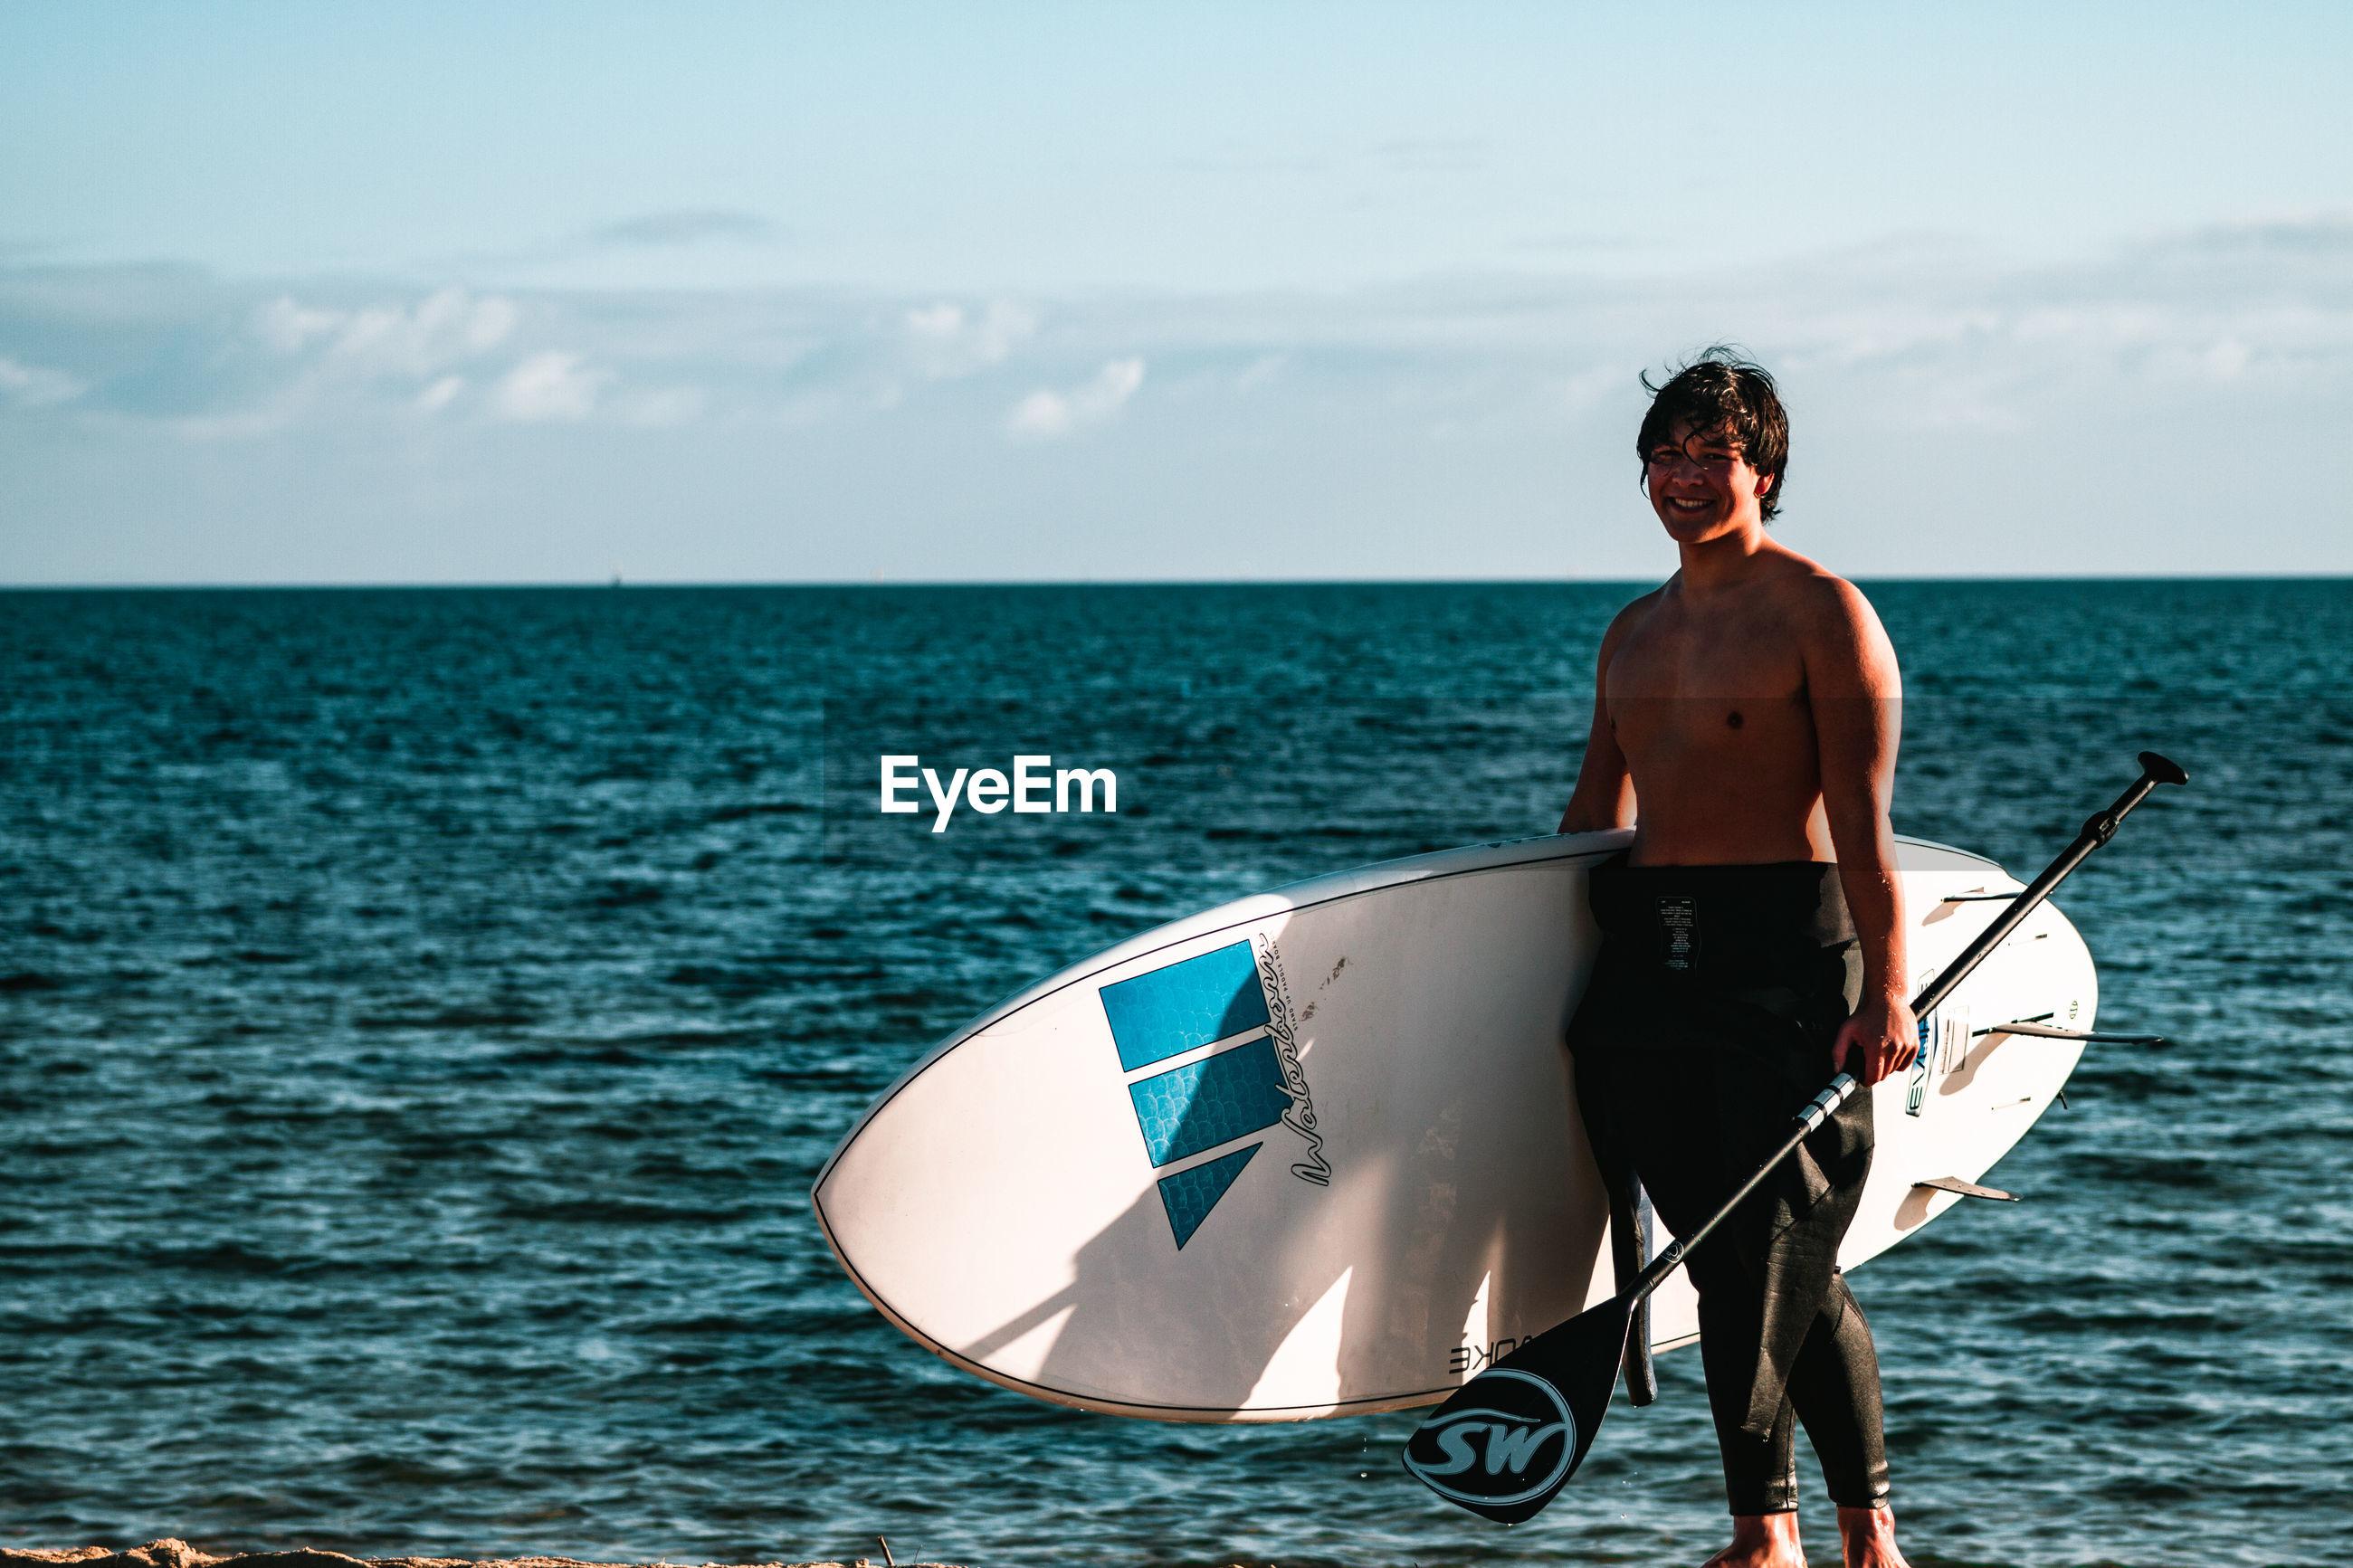 MAN STANDING IN BOAT AGAINST SEA